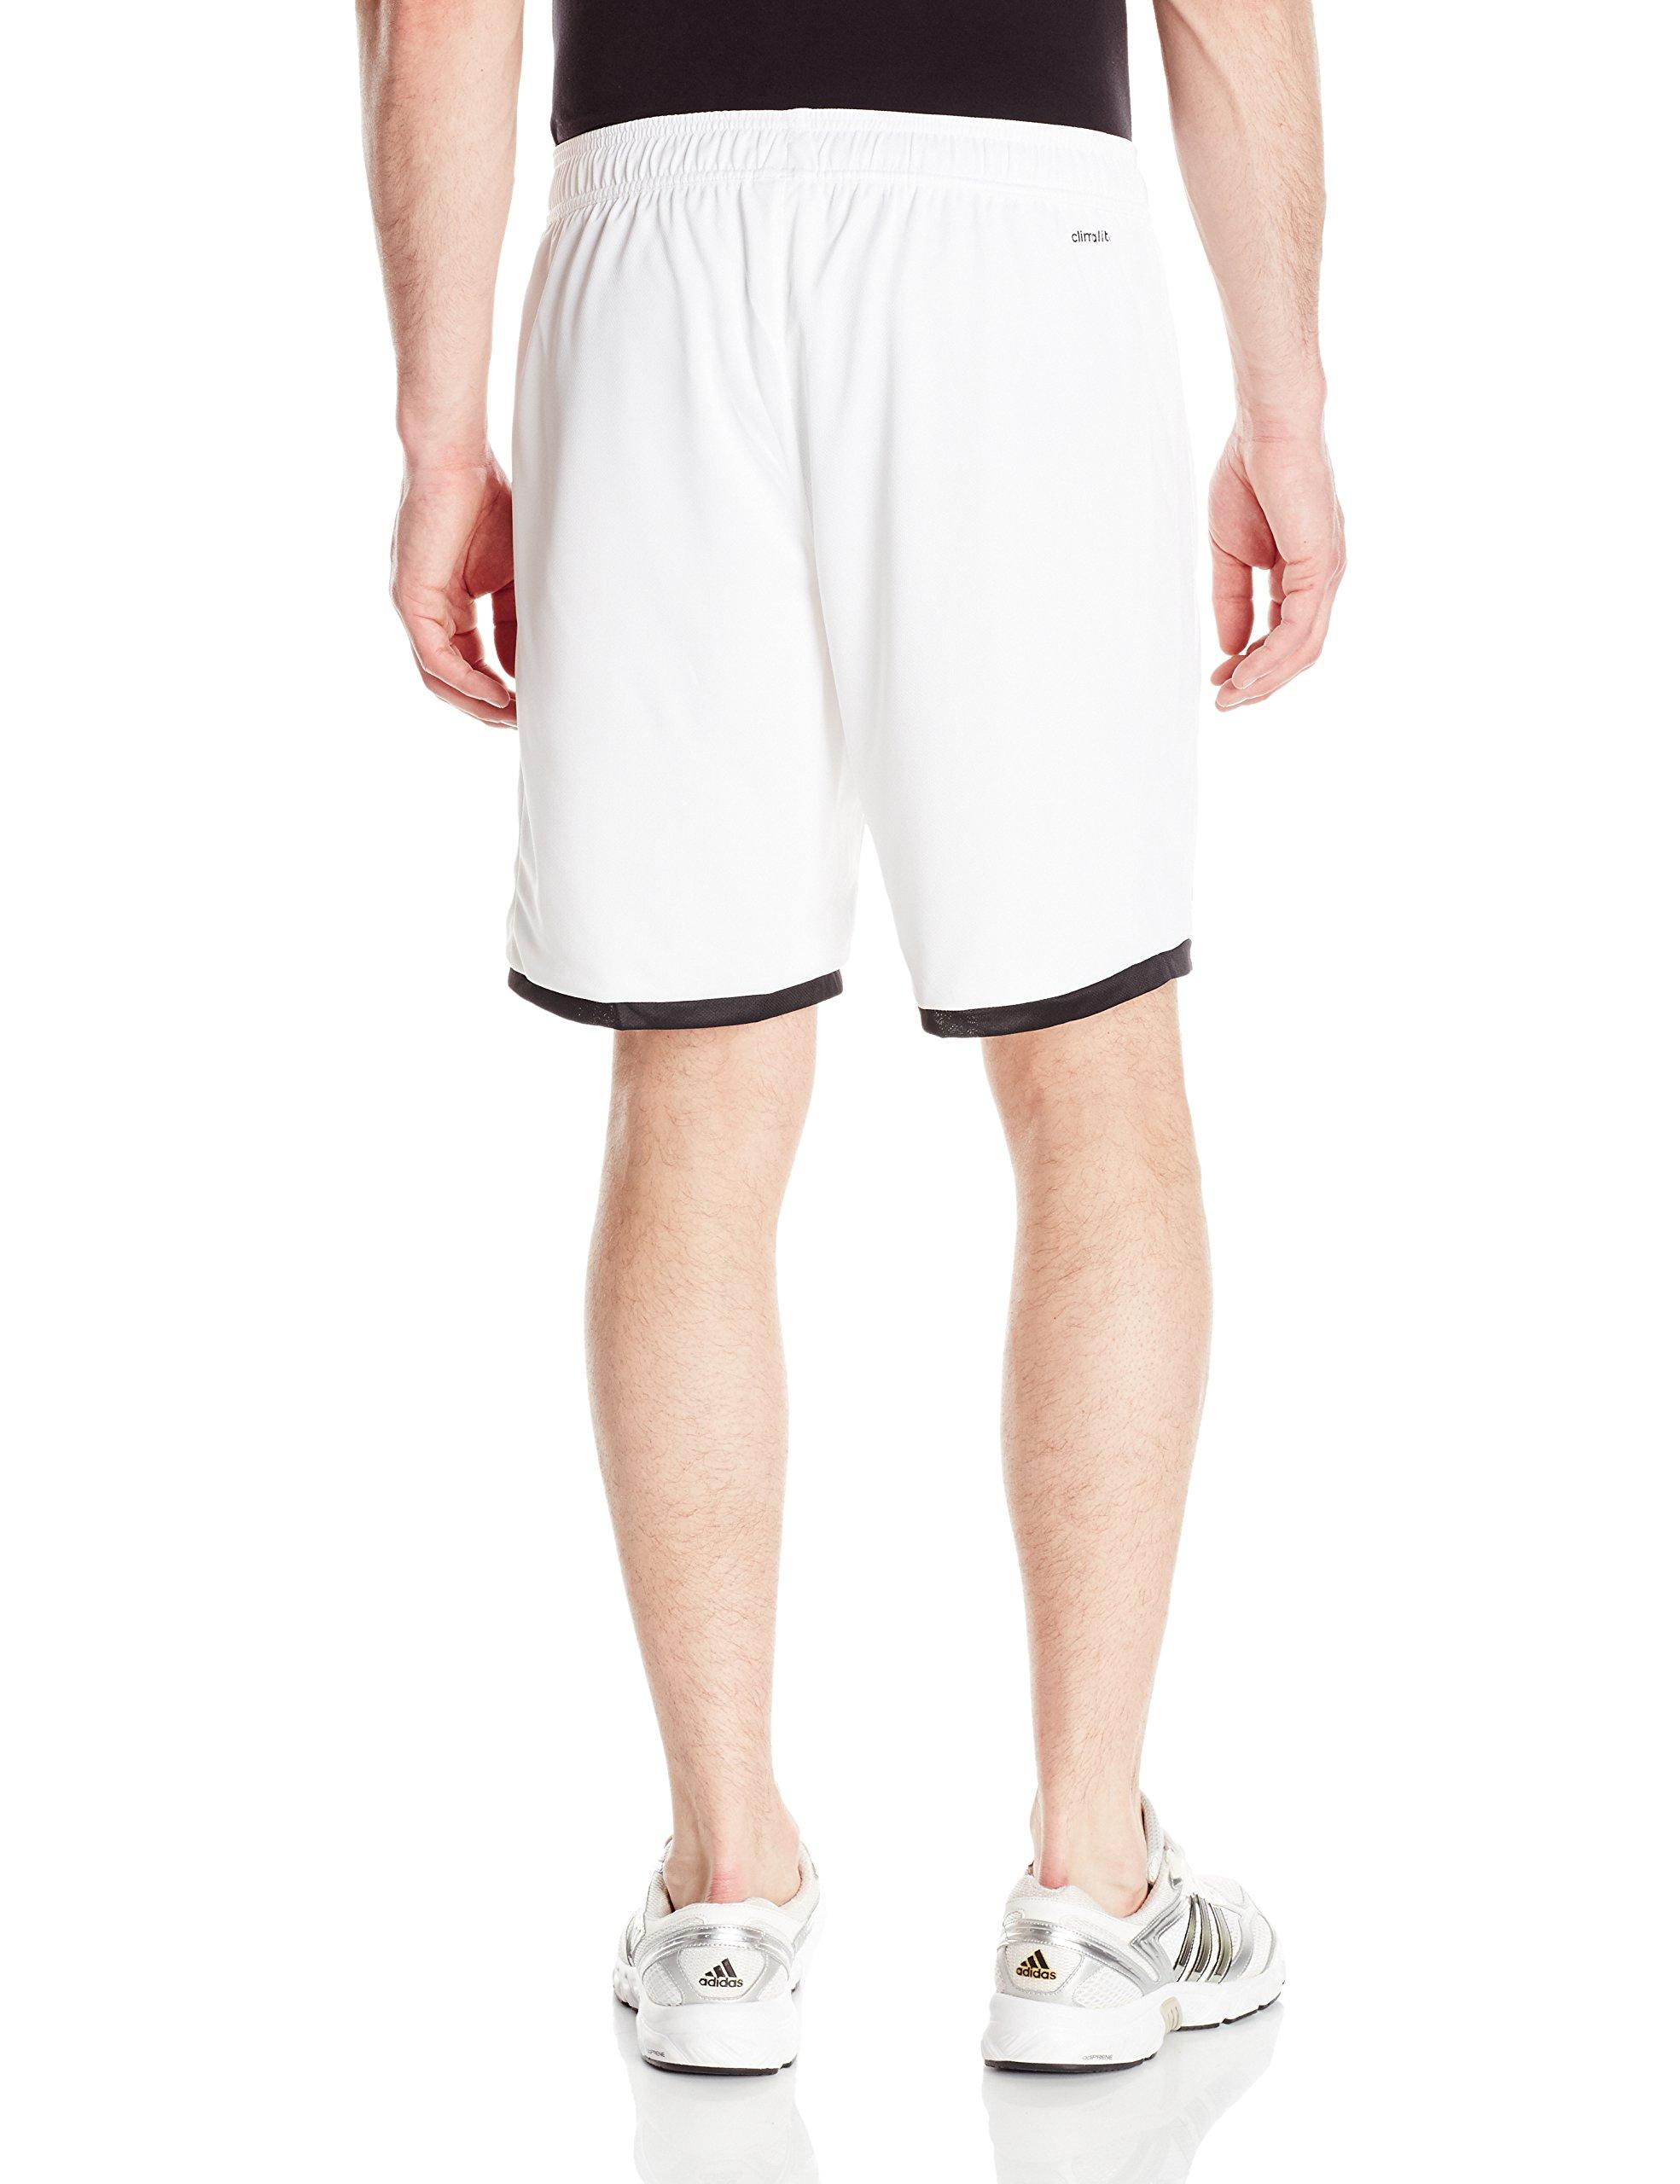 Adidas Men's Performance Athletic Court Short   eBay